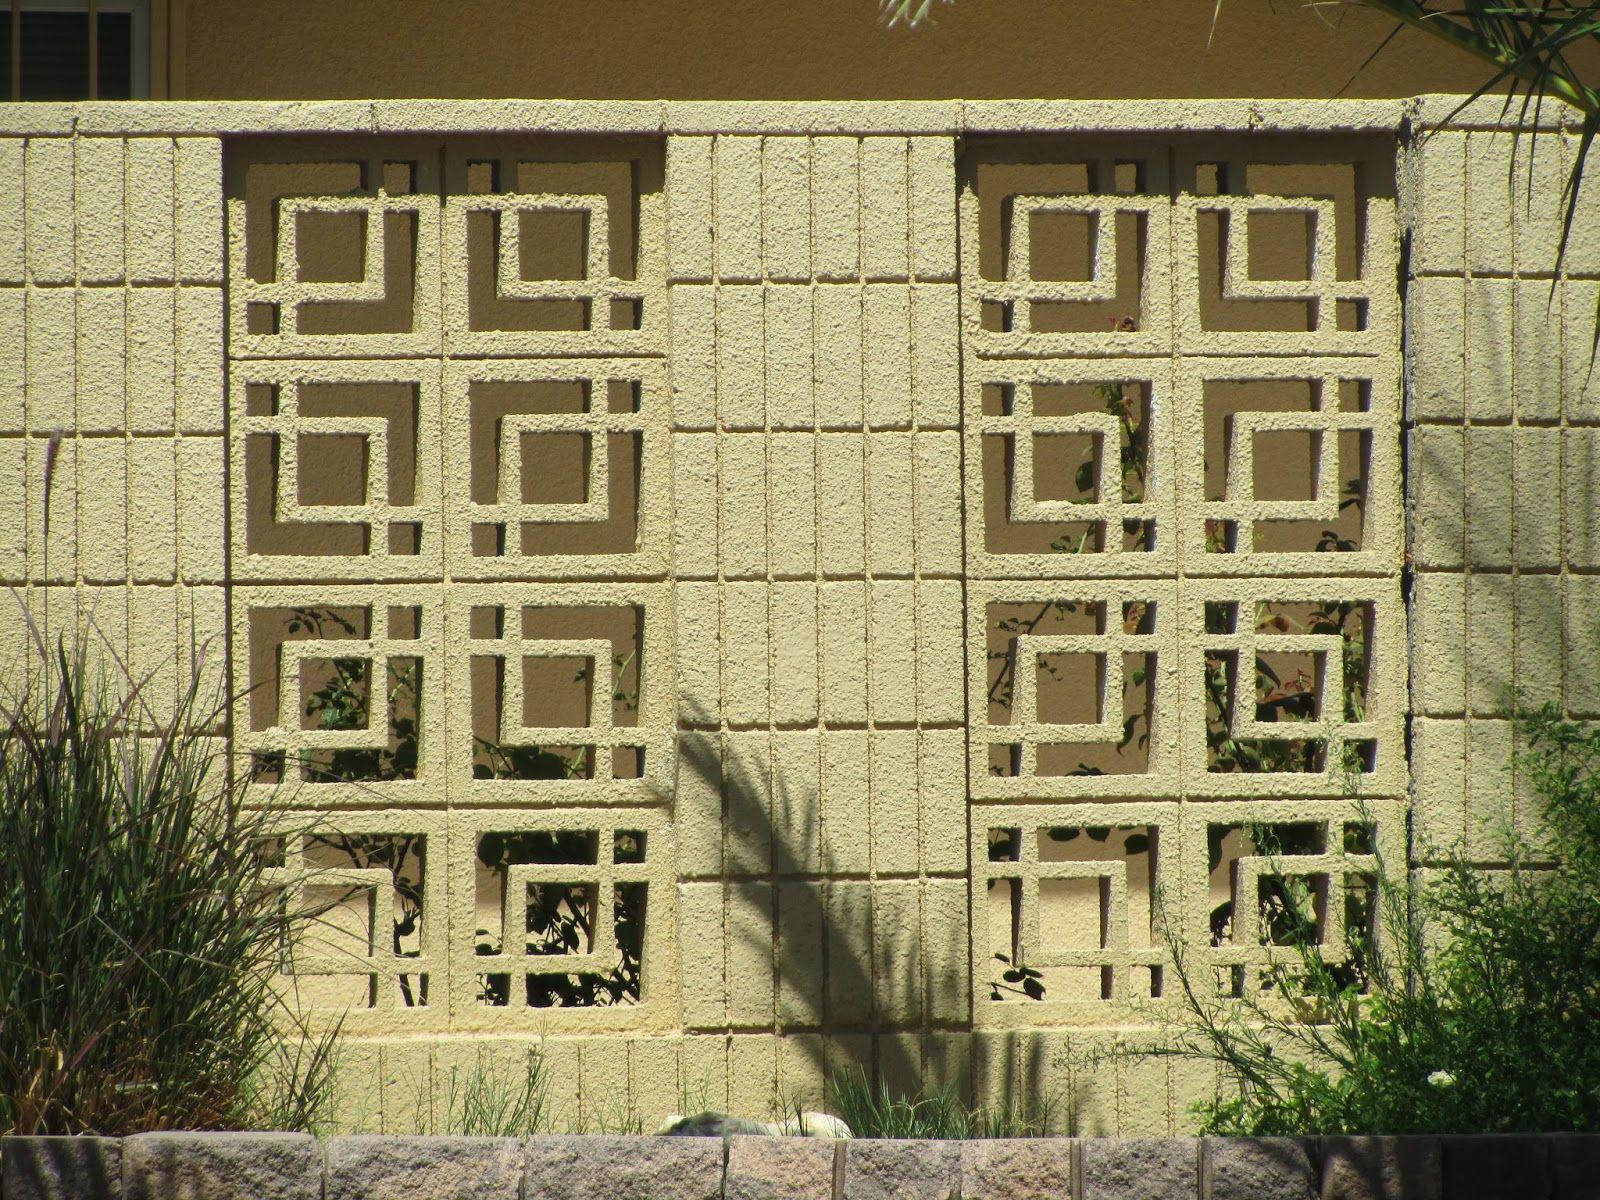 screen blocks wall - Google Search | 70\'s modern interior ...